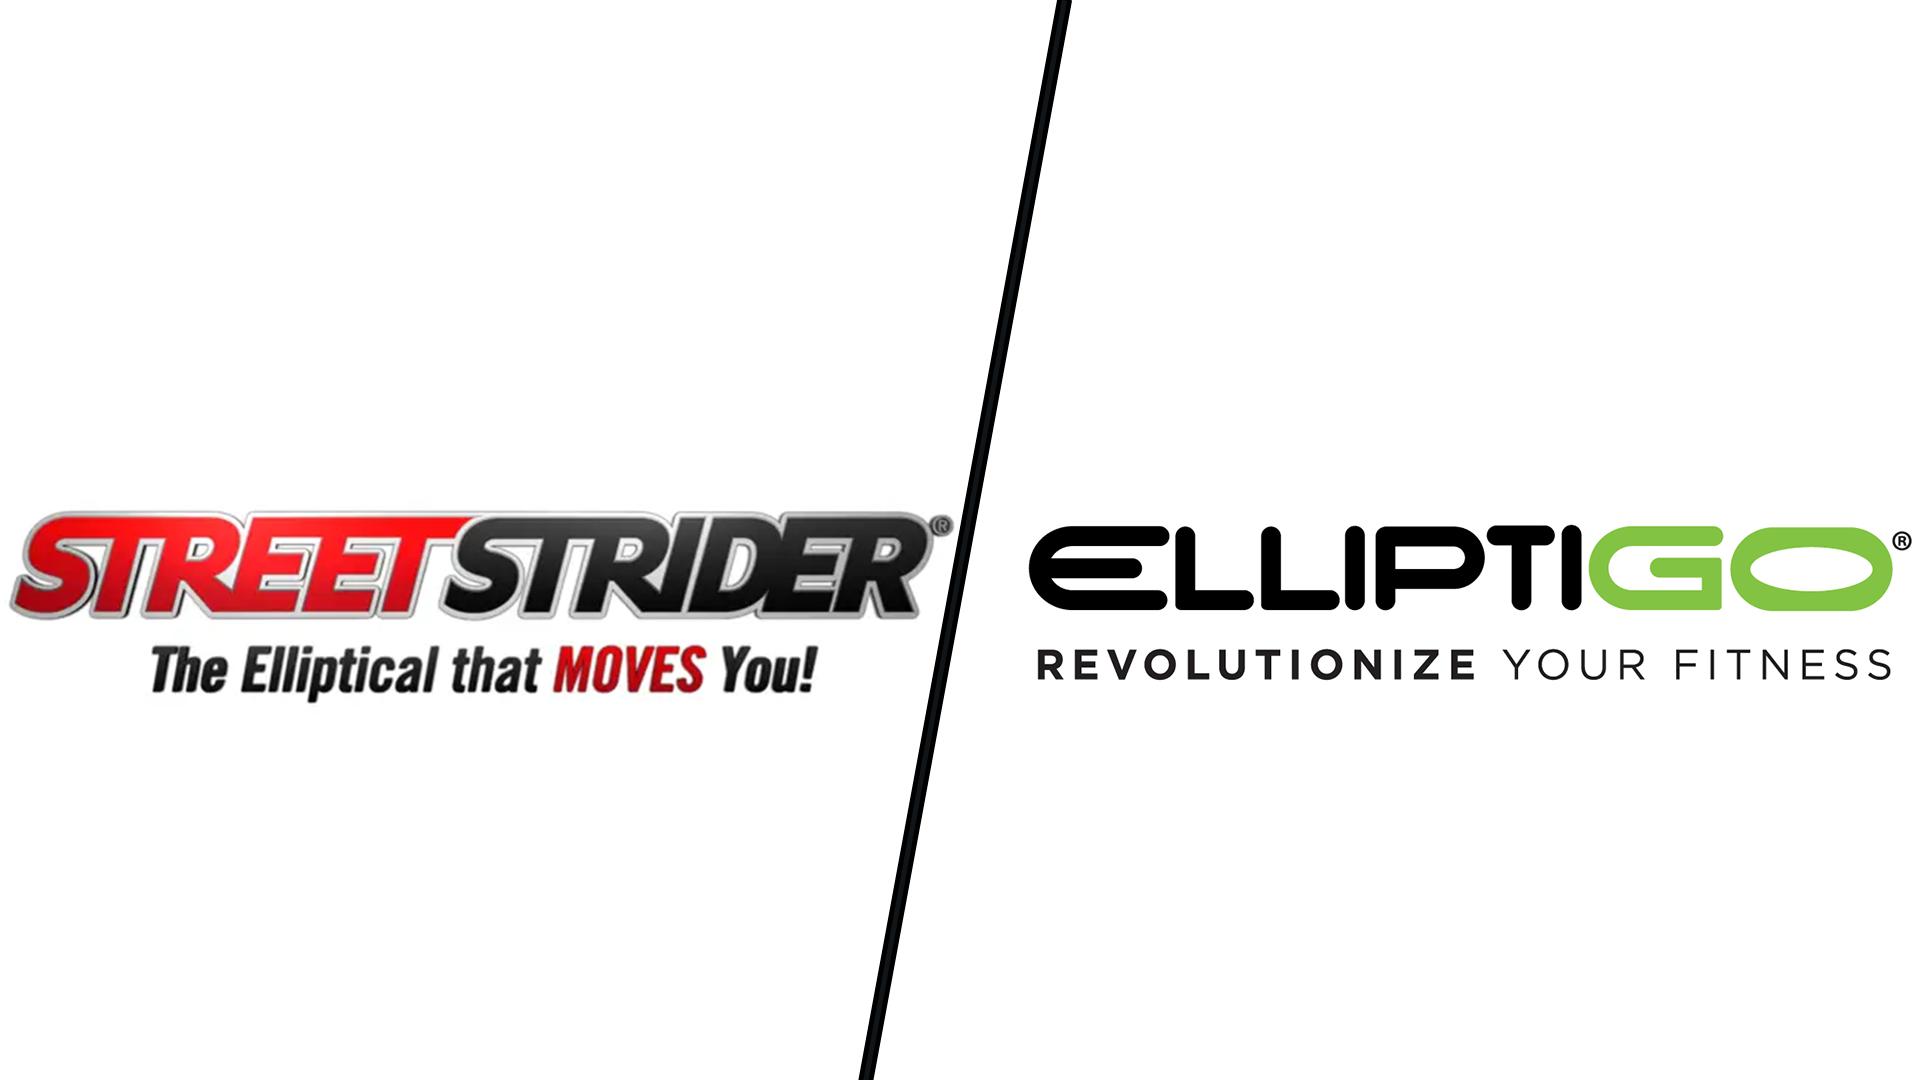 ElliptiGO vs. StreetStrider, which is better